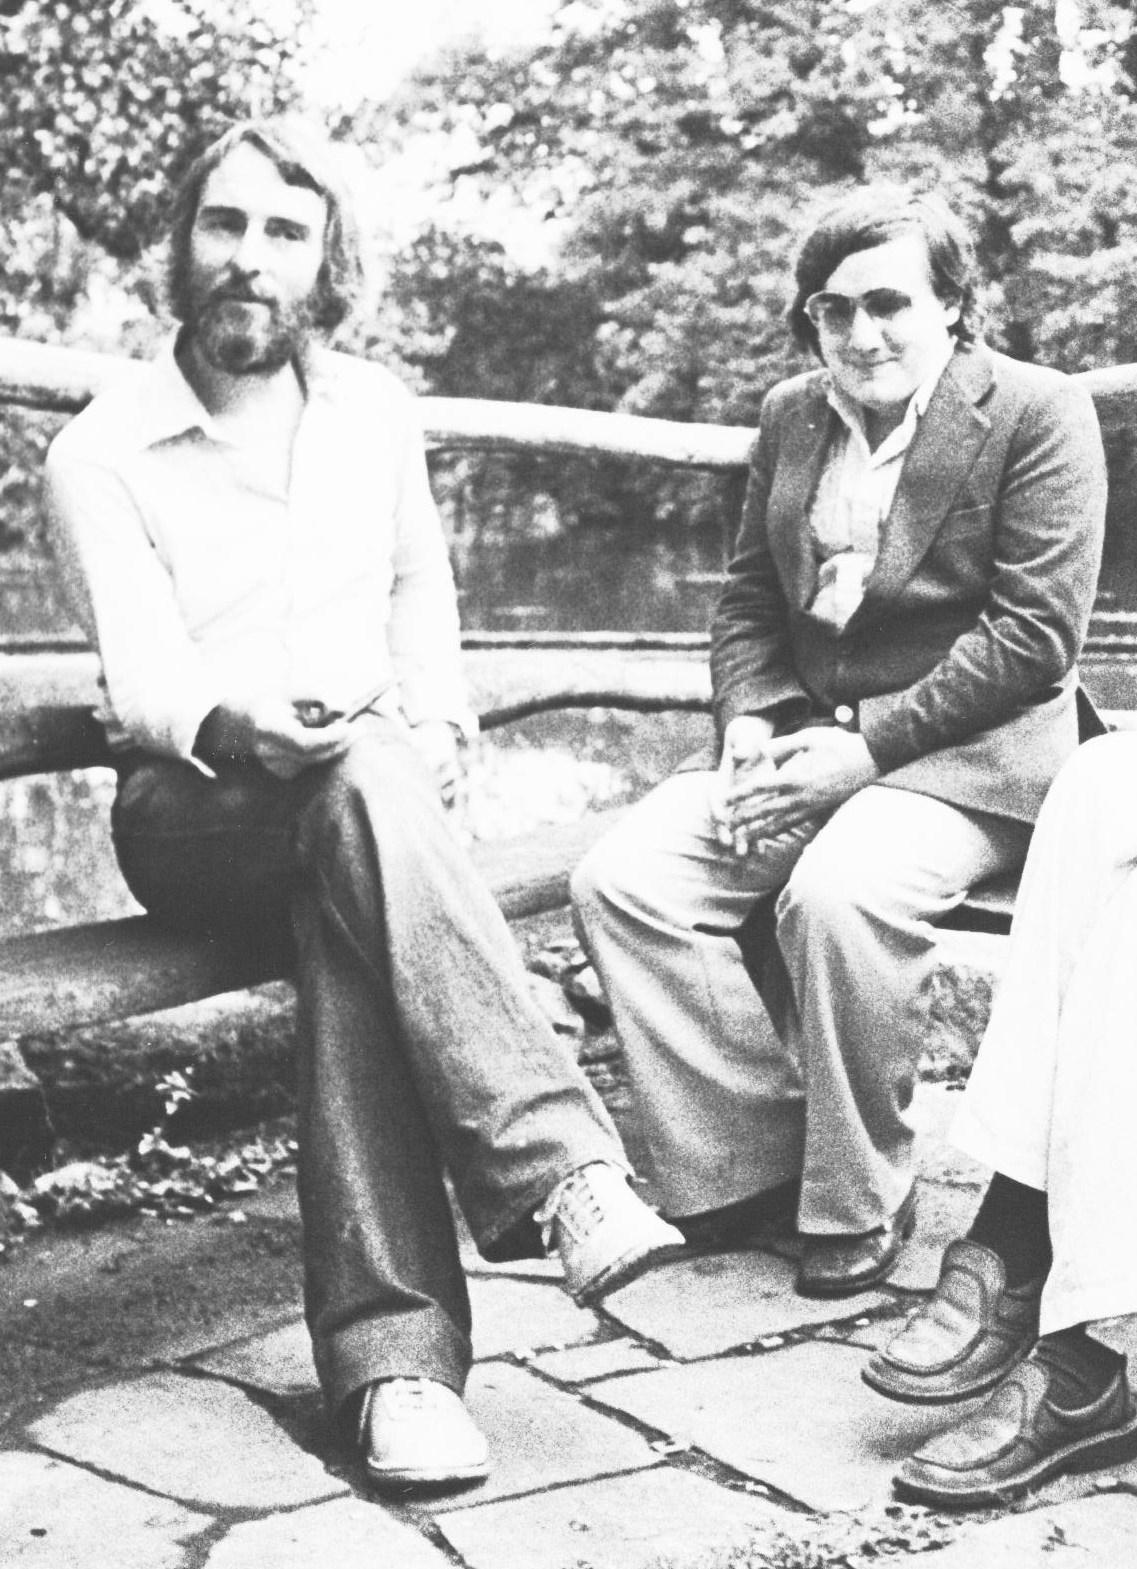 Adrian Kendon and Pete Jacobsen